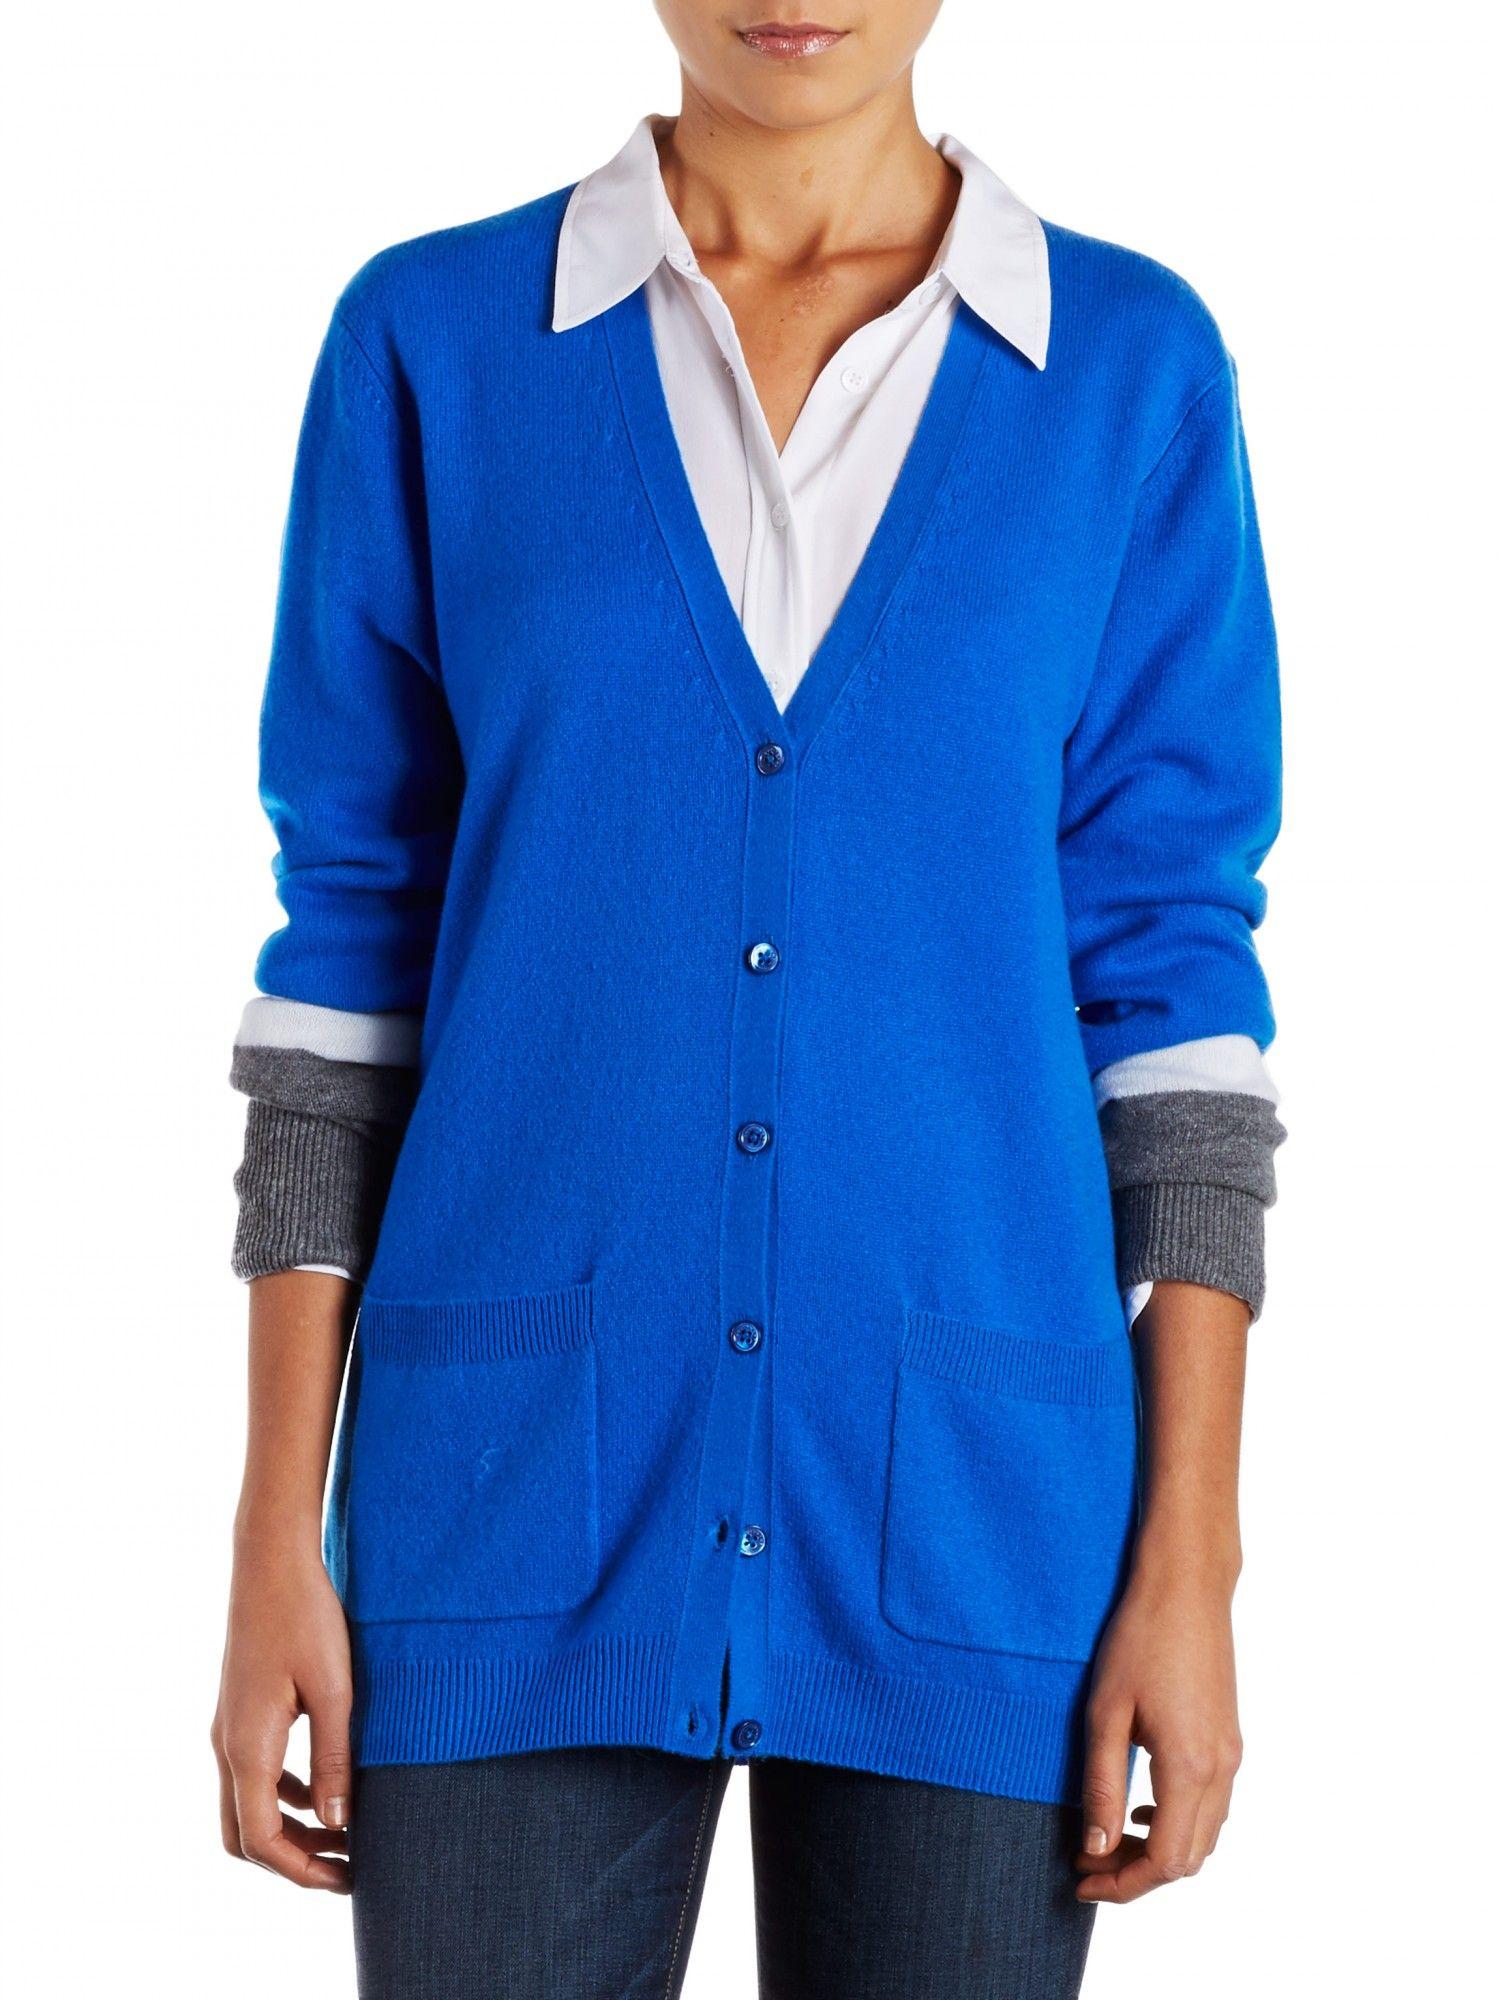 EQUIPMENT ELLA CARDIGAN in electric blue colorblock